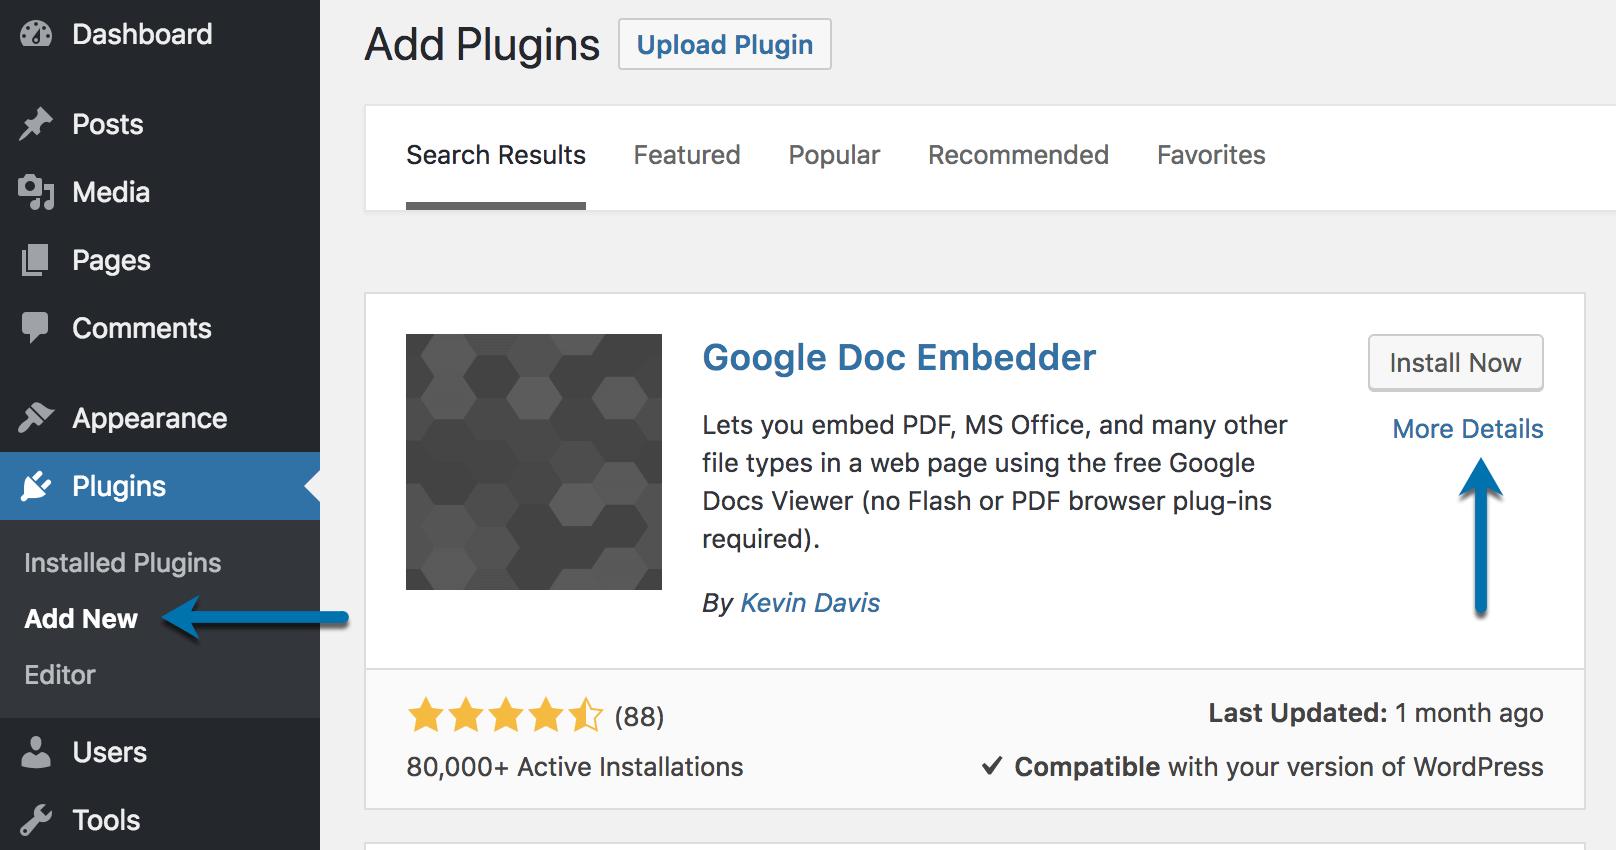 Google Doc Embedder Plugin Download Install